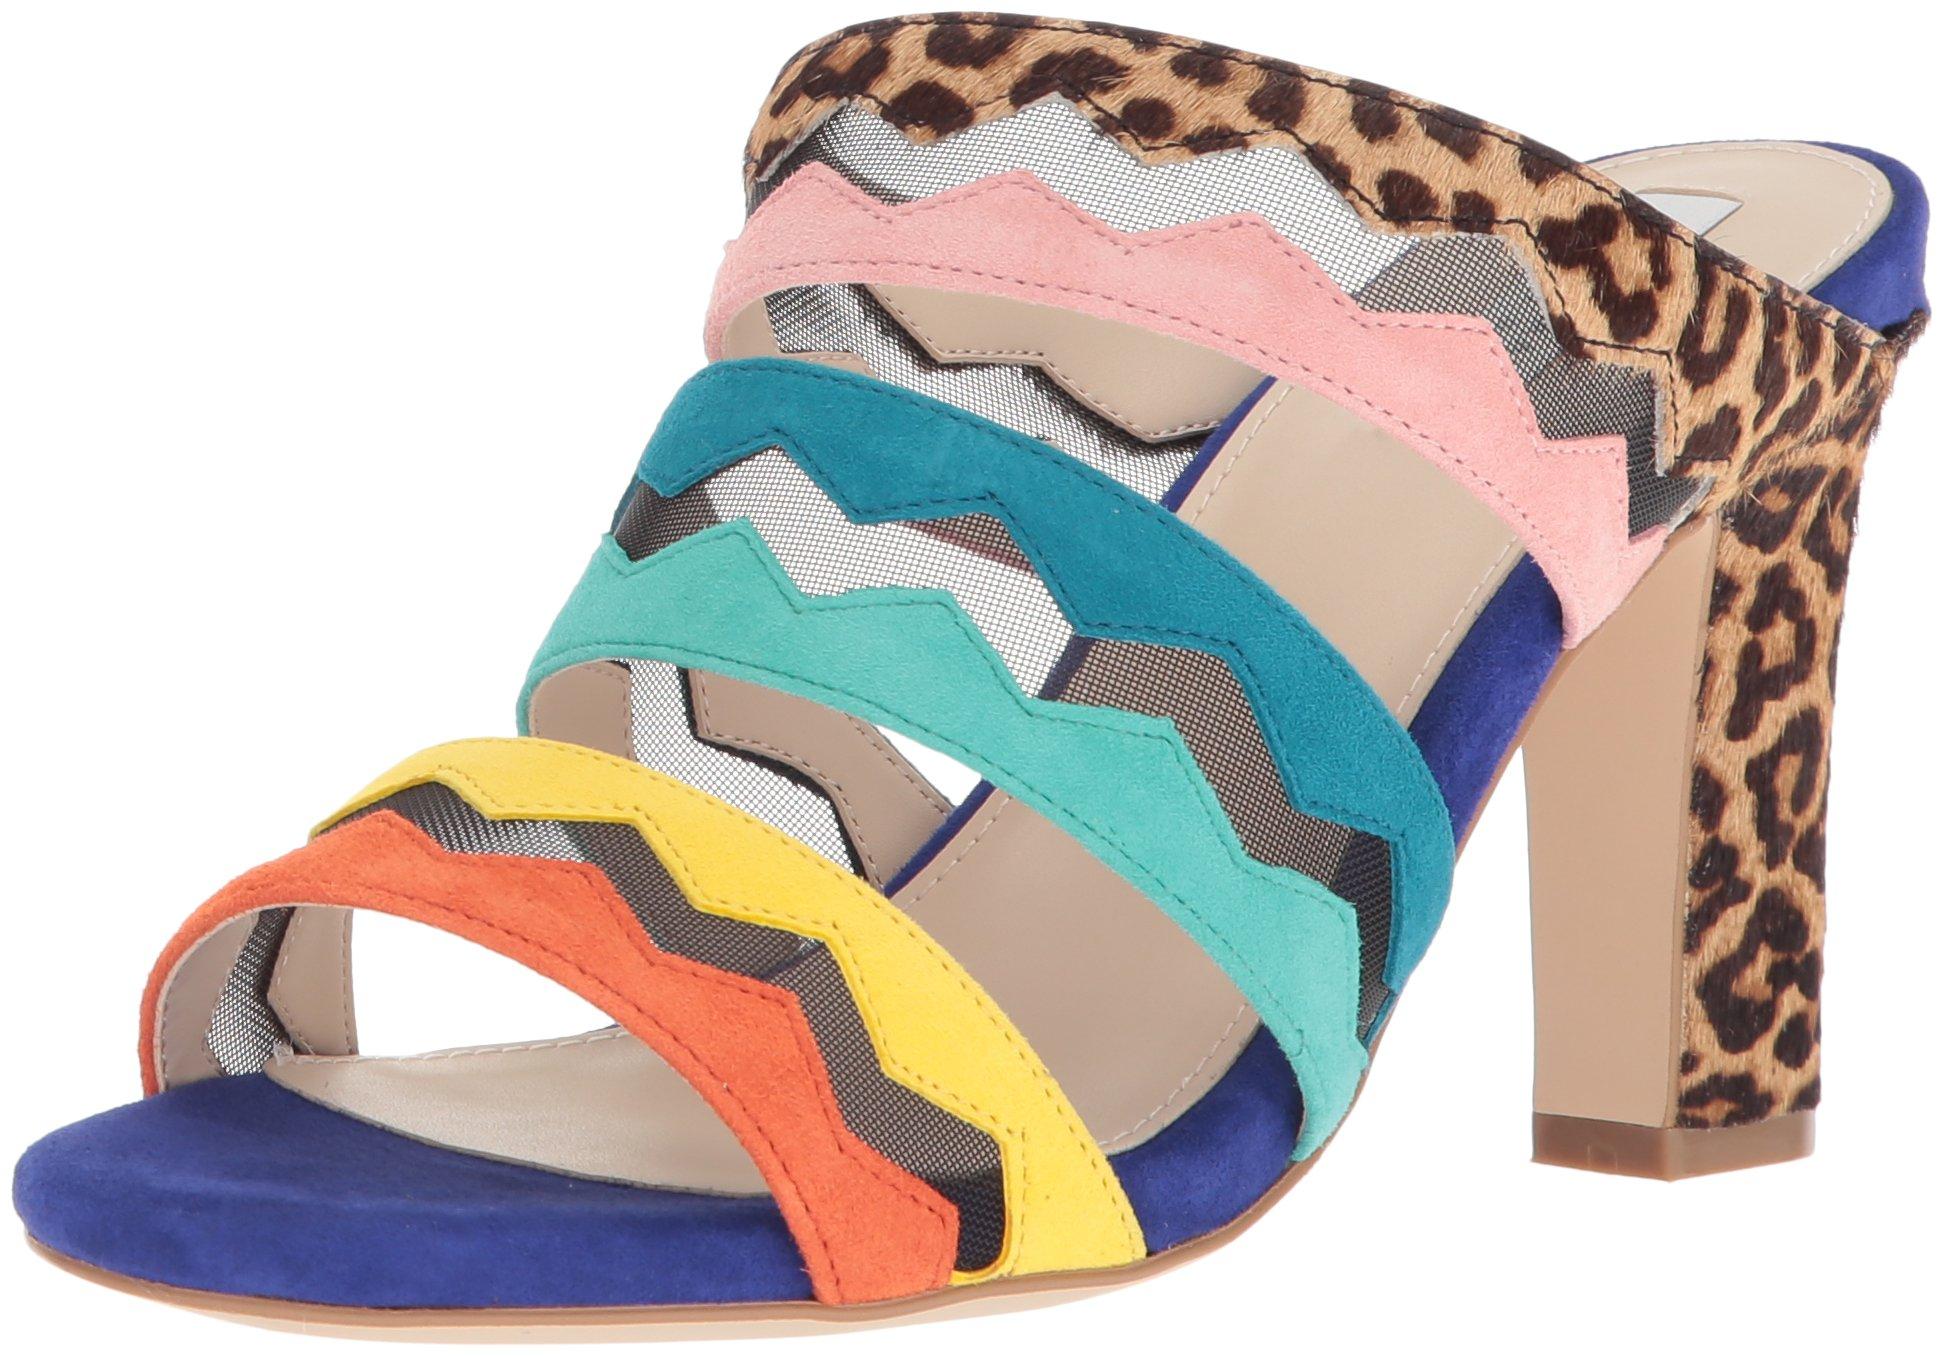 Cole Haan Women's Emilia High Slide Sandal, Ocelot, 7 B US